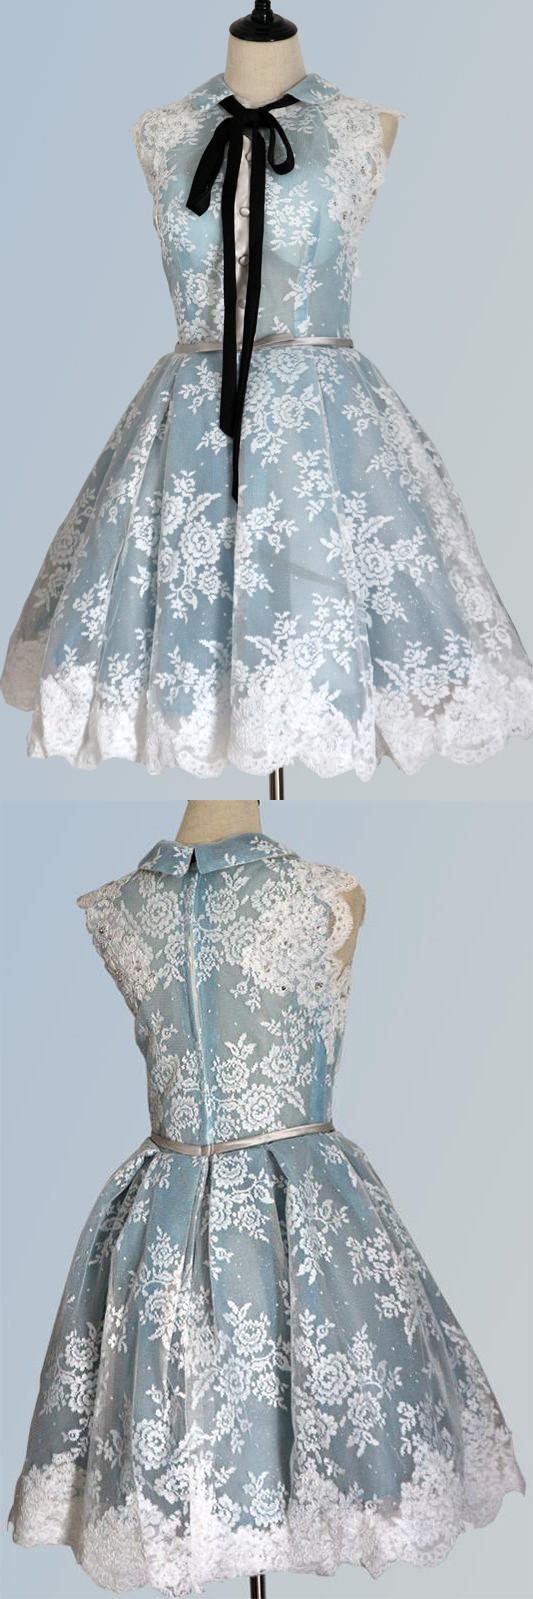 Cute a line lace short homecoming dressesgraduation party dress